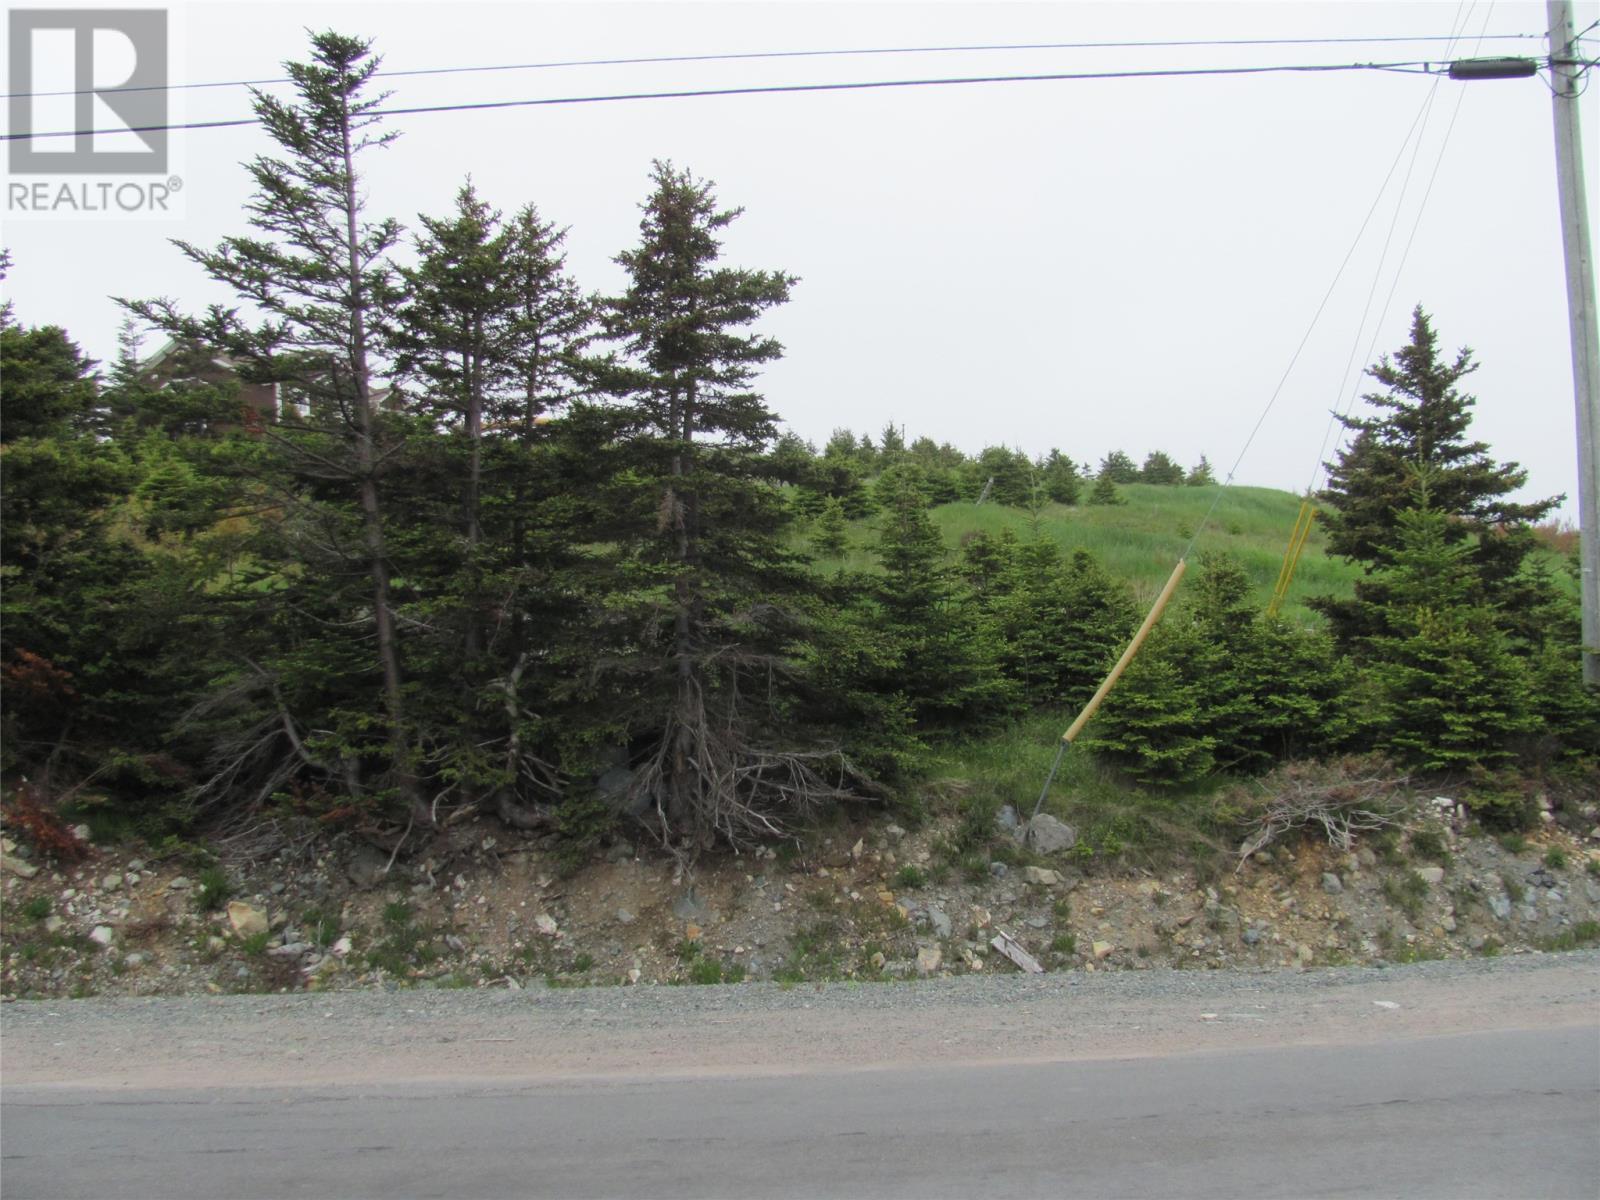 72 John Cabot Drive, Bonavista, Newfoundland & Labrador  A0C 1B0 - Photo 4 - 1197415